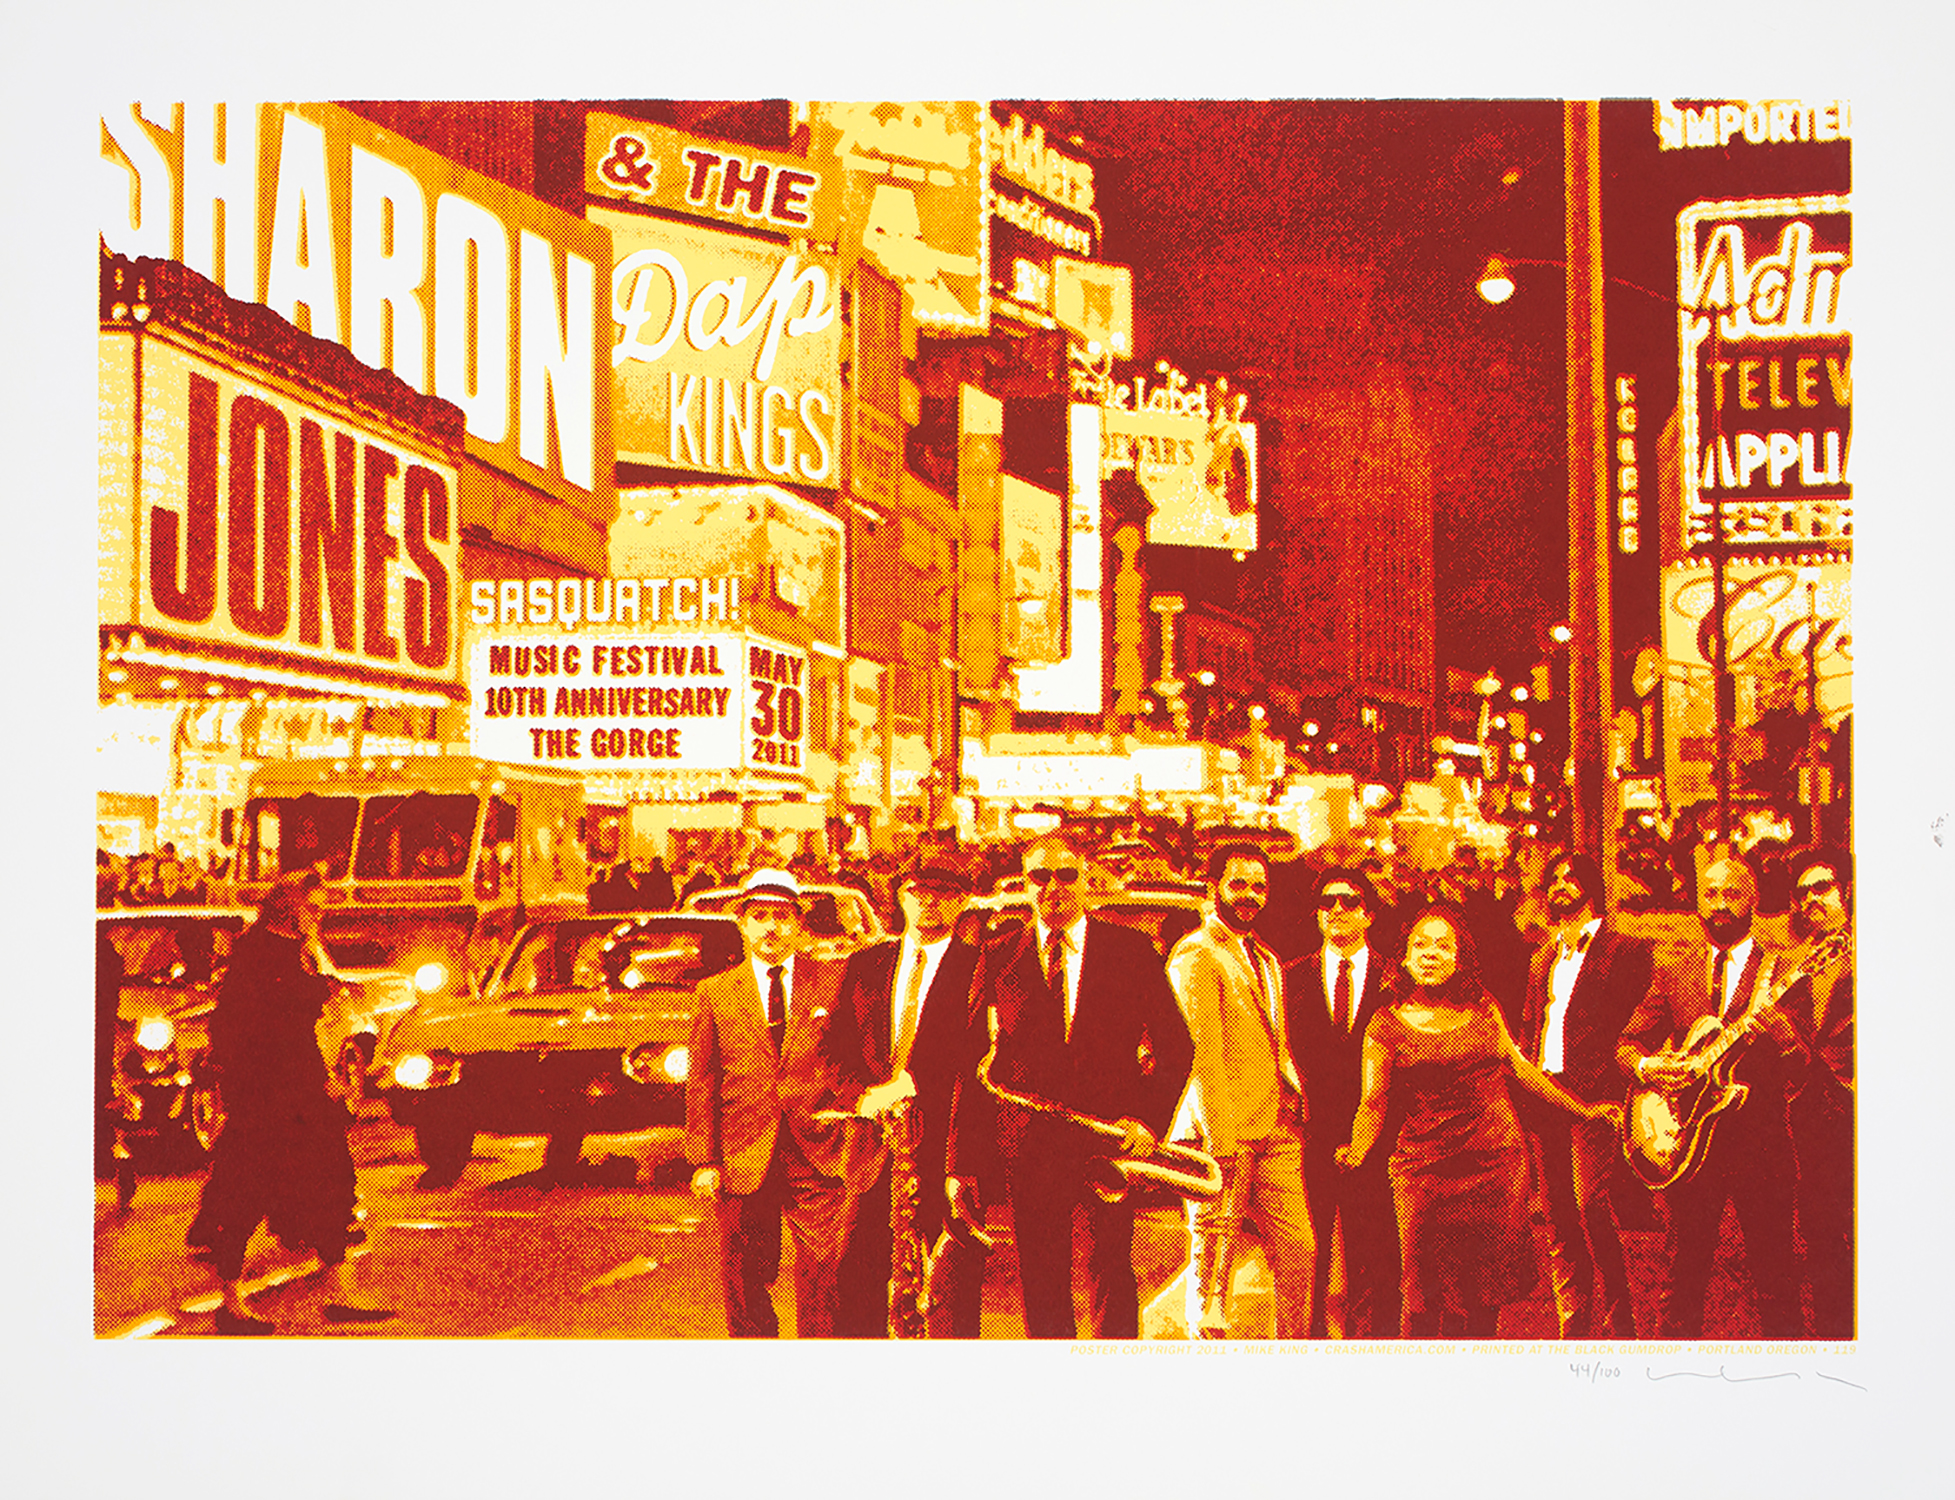 Sharon Jones and the Dap Kings Concert Poster